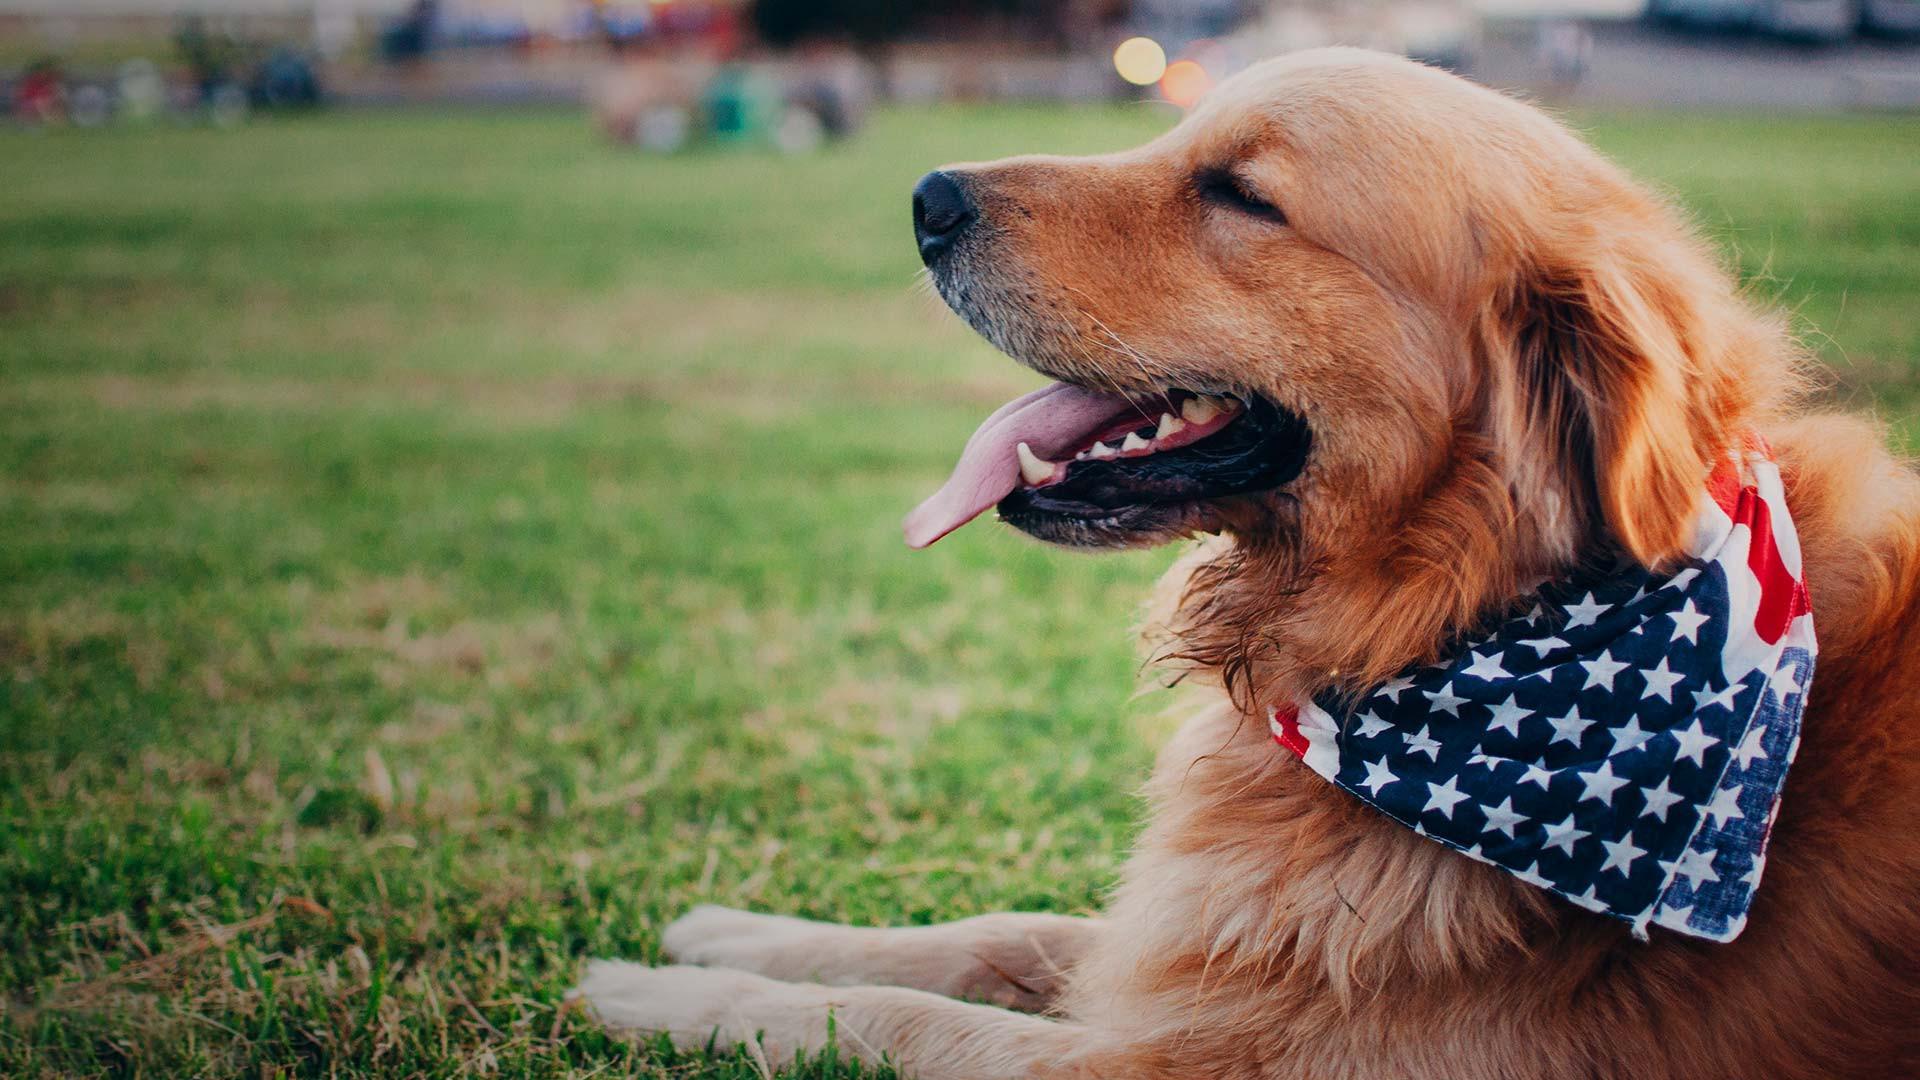 Pet Friendly Resorts in Williamsburg, VA | Williamsburg Hotels | Westgate Resorts